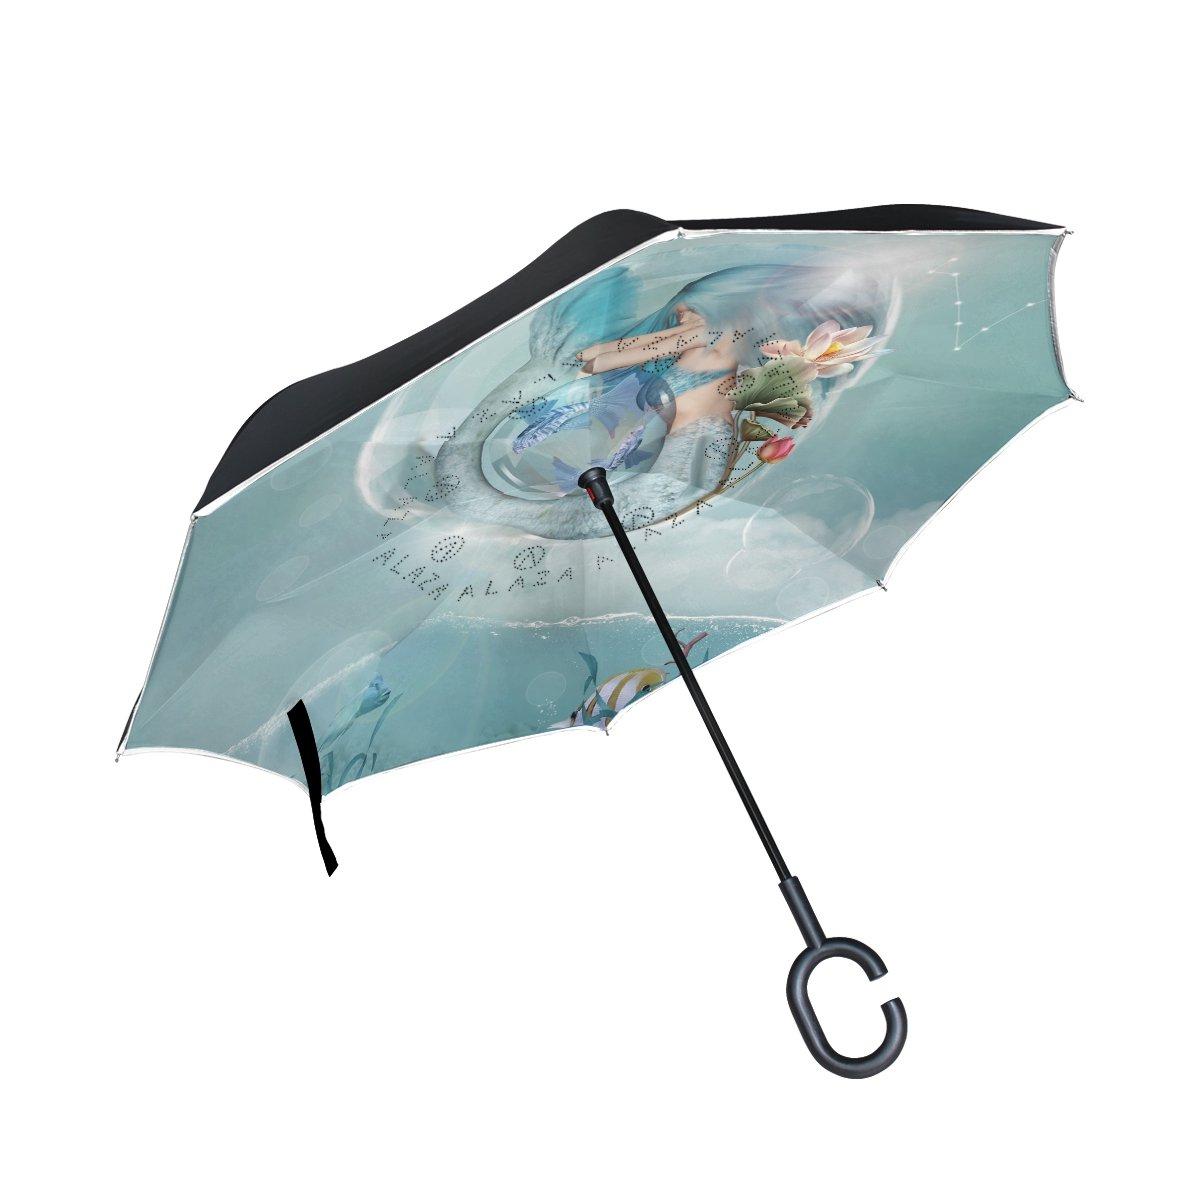 Alaza Orezi星座シリーズうお座Inverted傘二層構造防風UV保護ストレート自立型逆傘C型の車の雨アウトドア旅行   B07DGYBX64